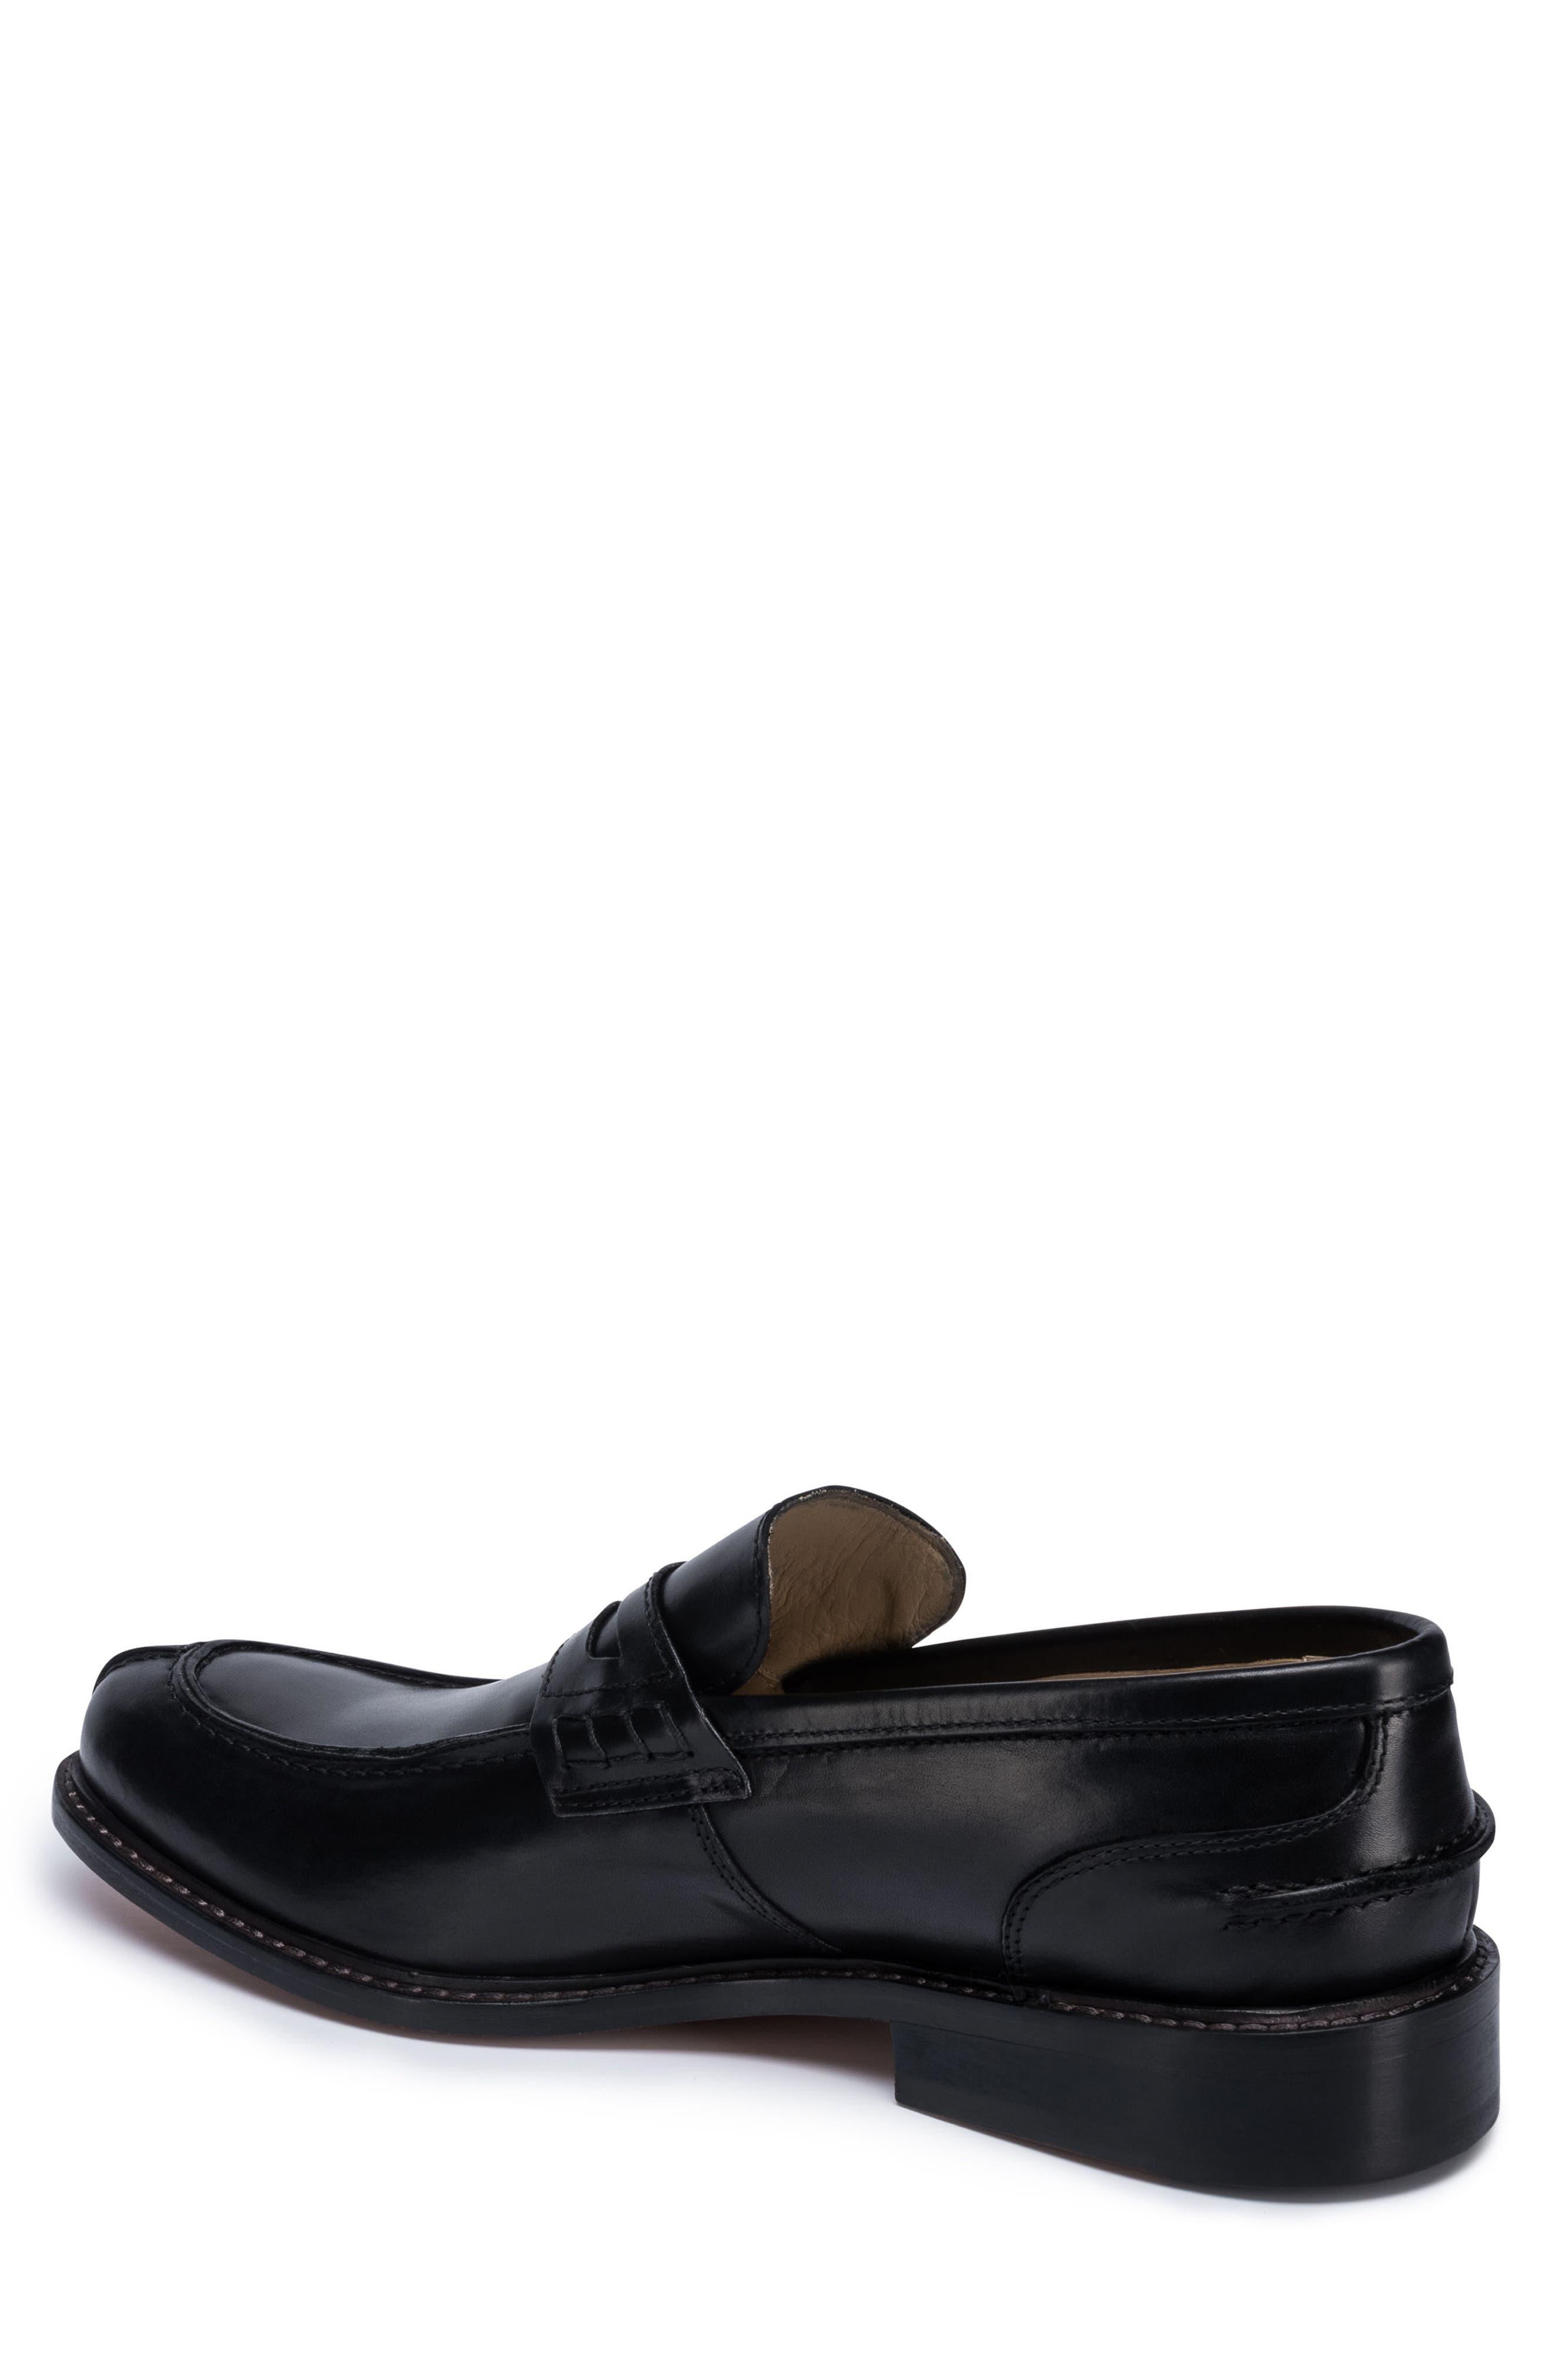 Alternate Image 2  - Bugatchi Apron Toe Penny Loafer (Men)